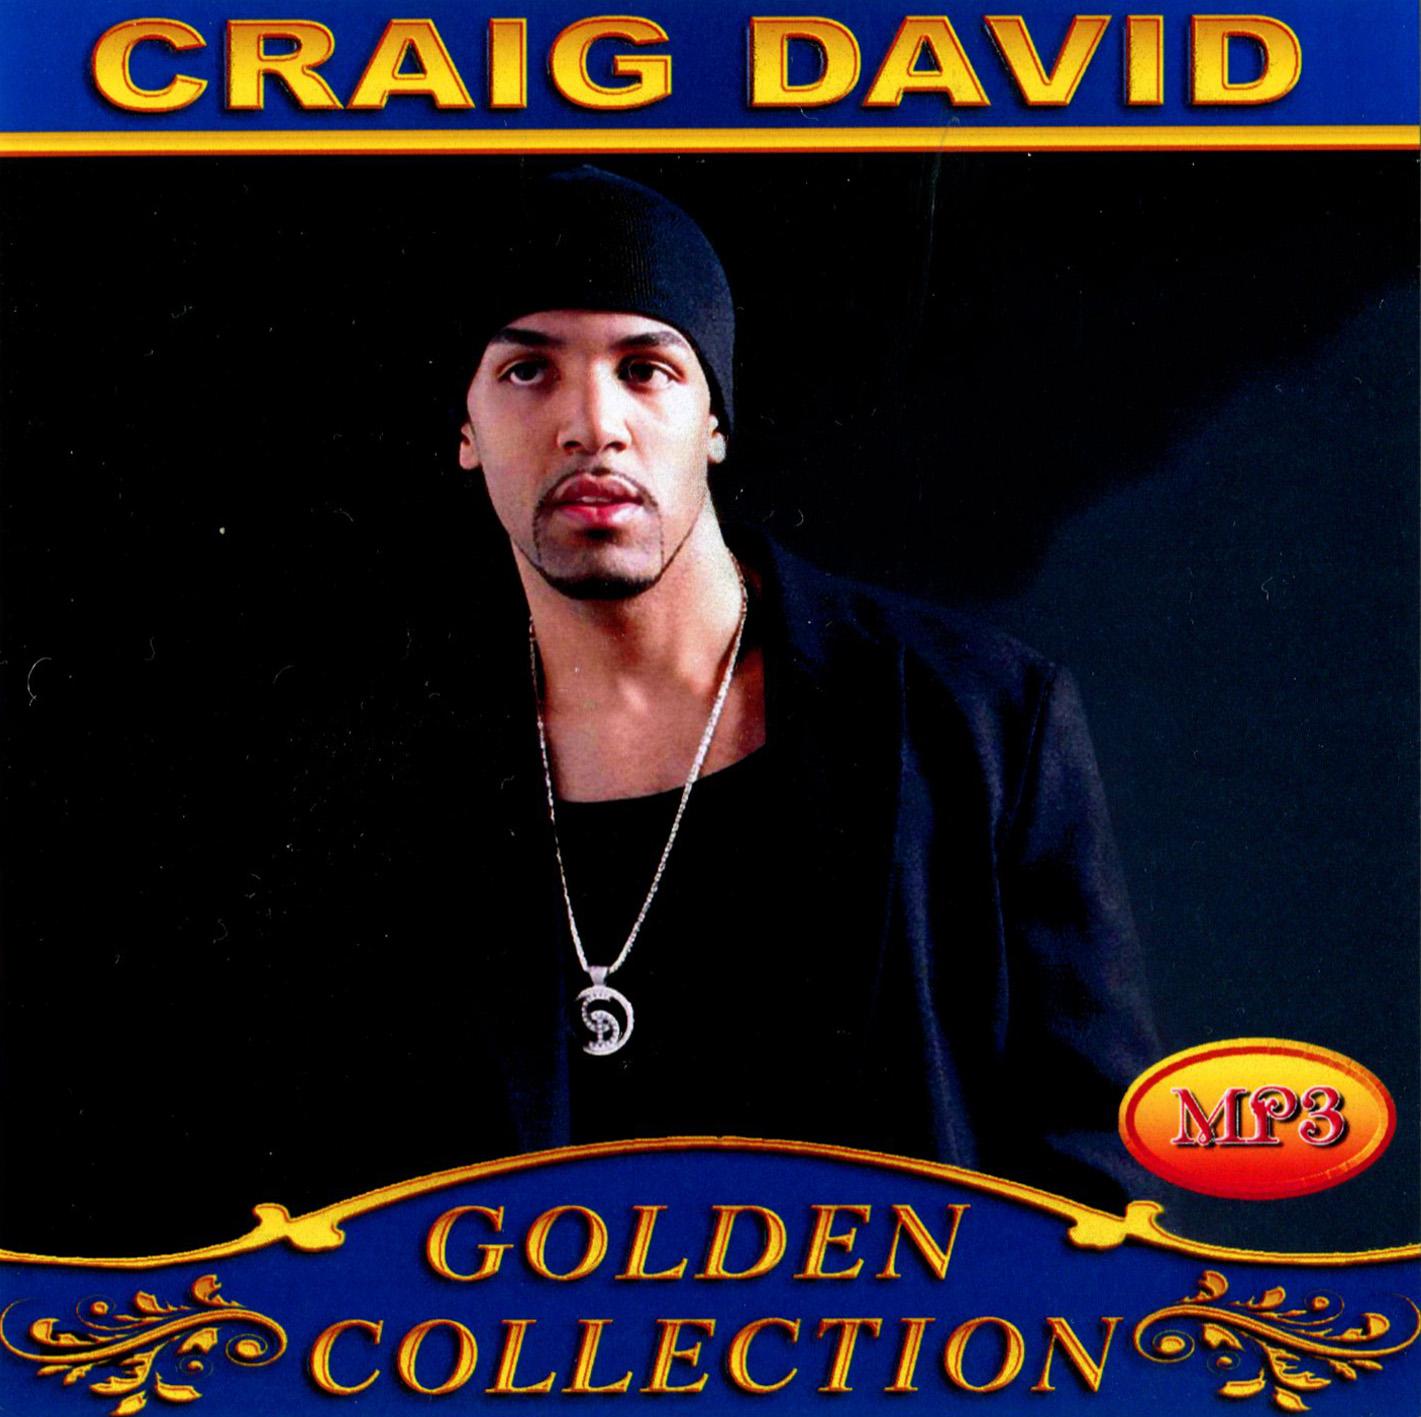 Craig David [mp3]